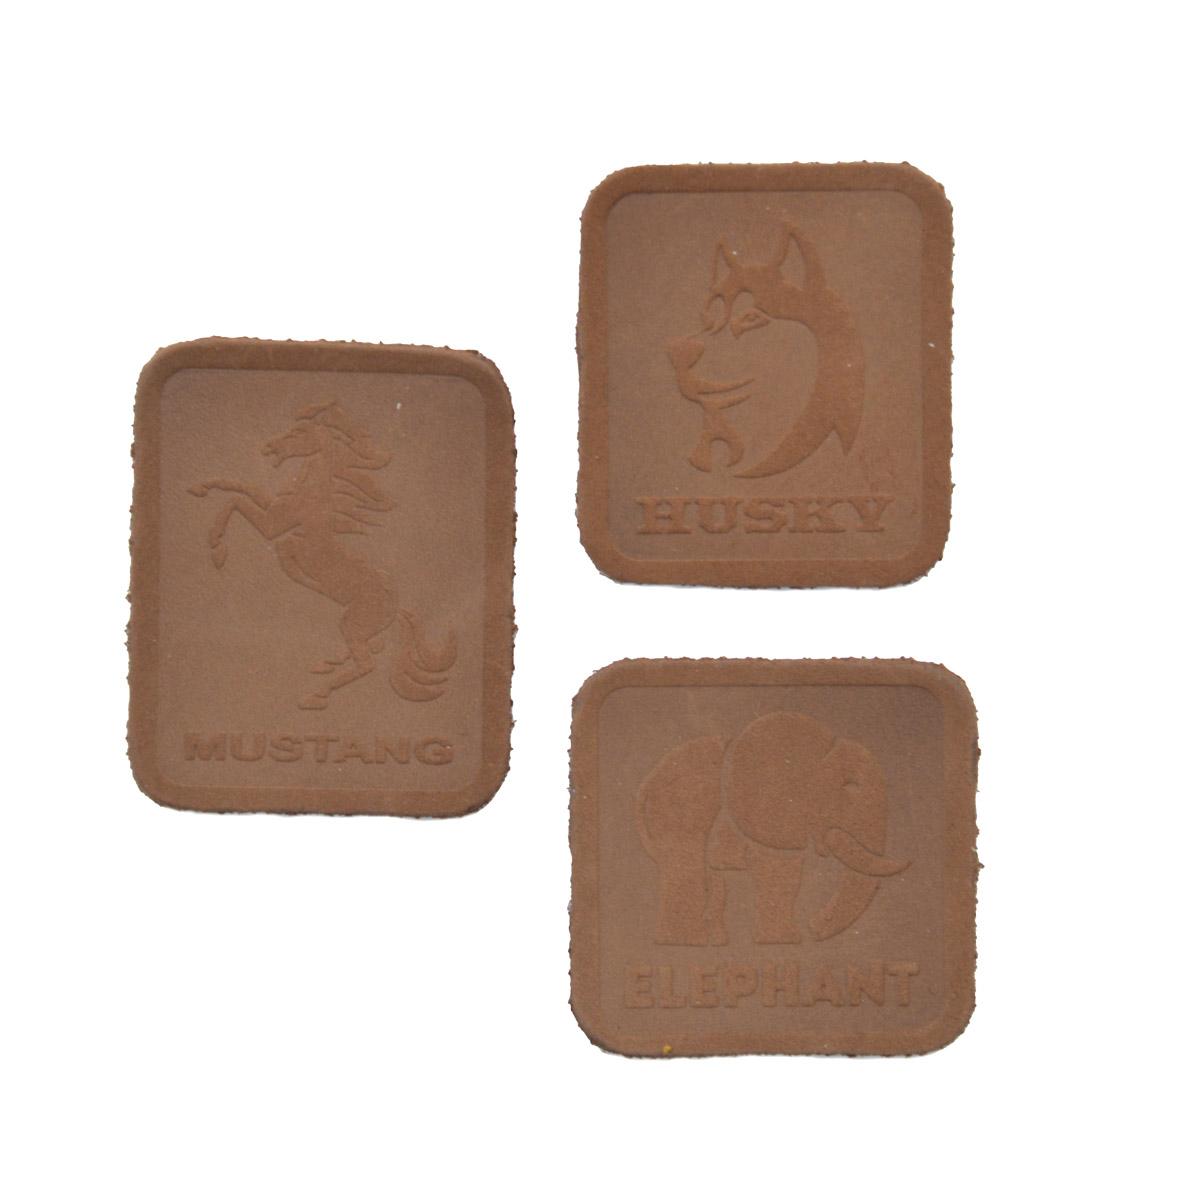 5006 Набор термоаппликаций из замши: Husky - 1шт. Mustang - 1шт. Elephant - 1шт, 100% кожа